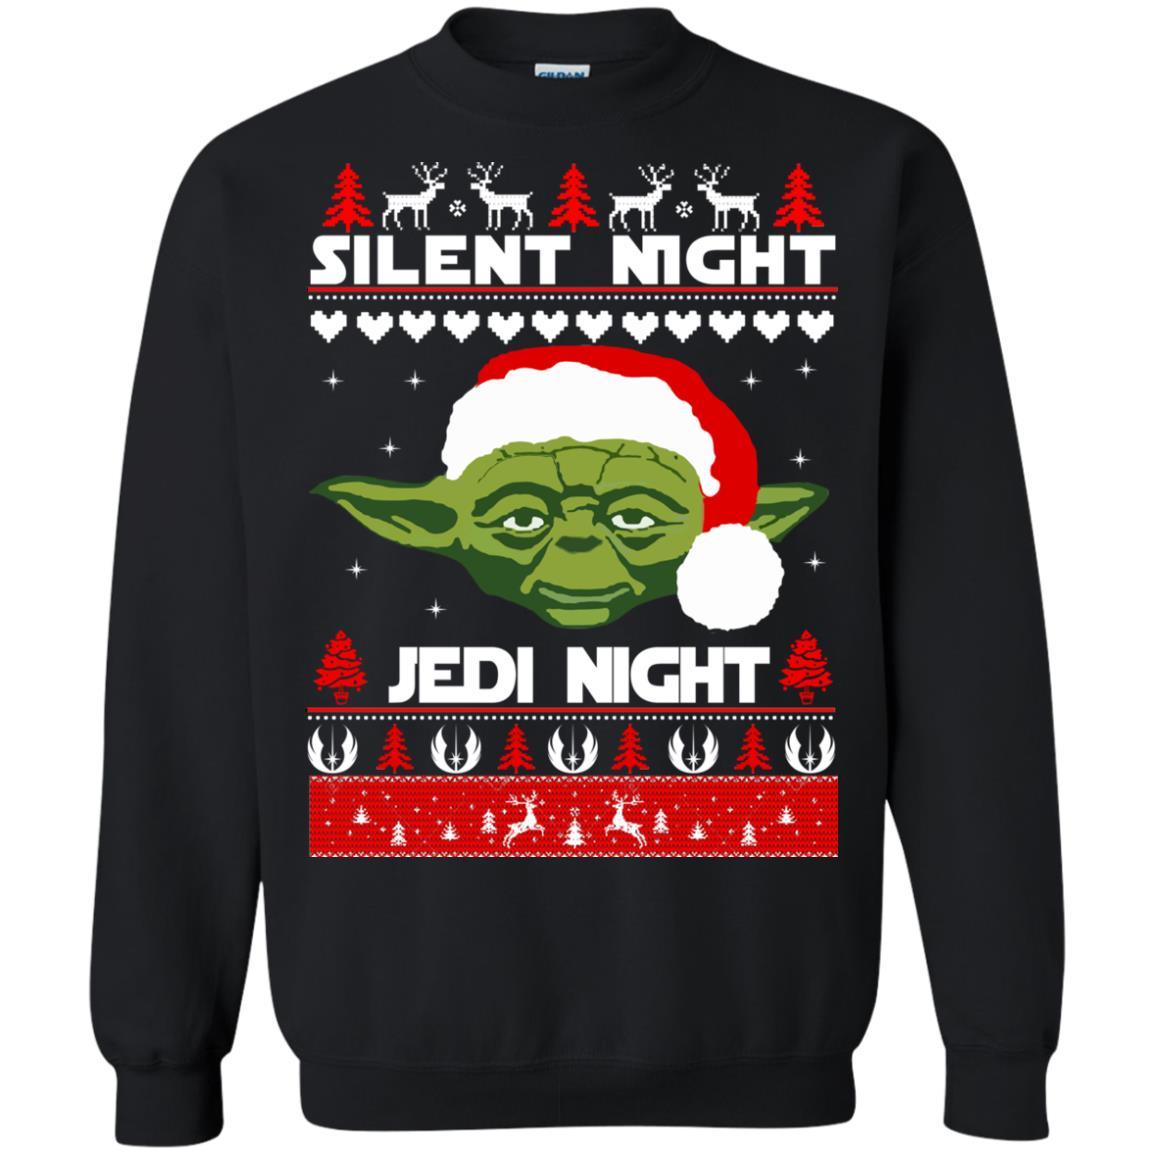 image 1716 - Yoda Star Wars: Silent Night Jedi Night Christmas Sweater, Hoodie